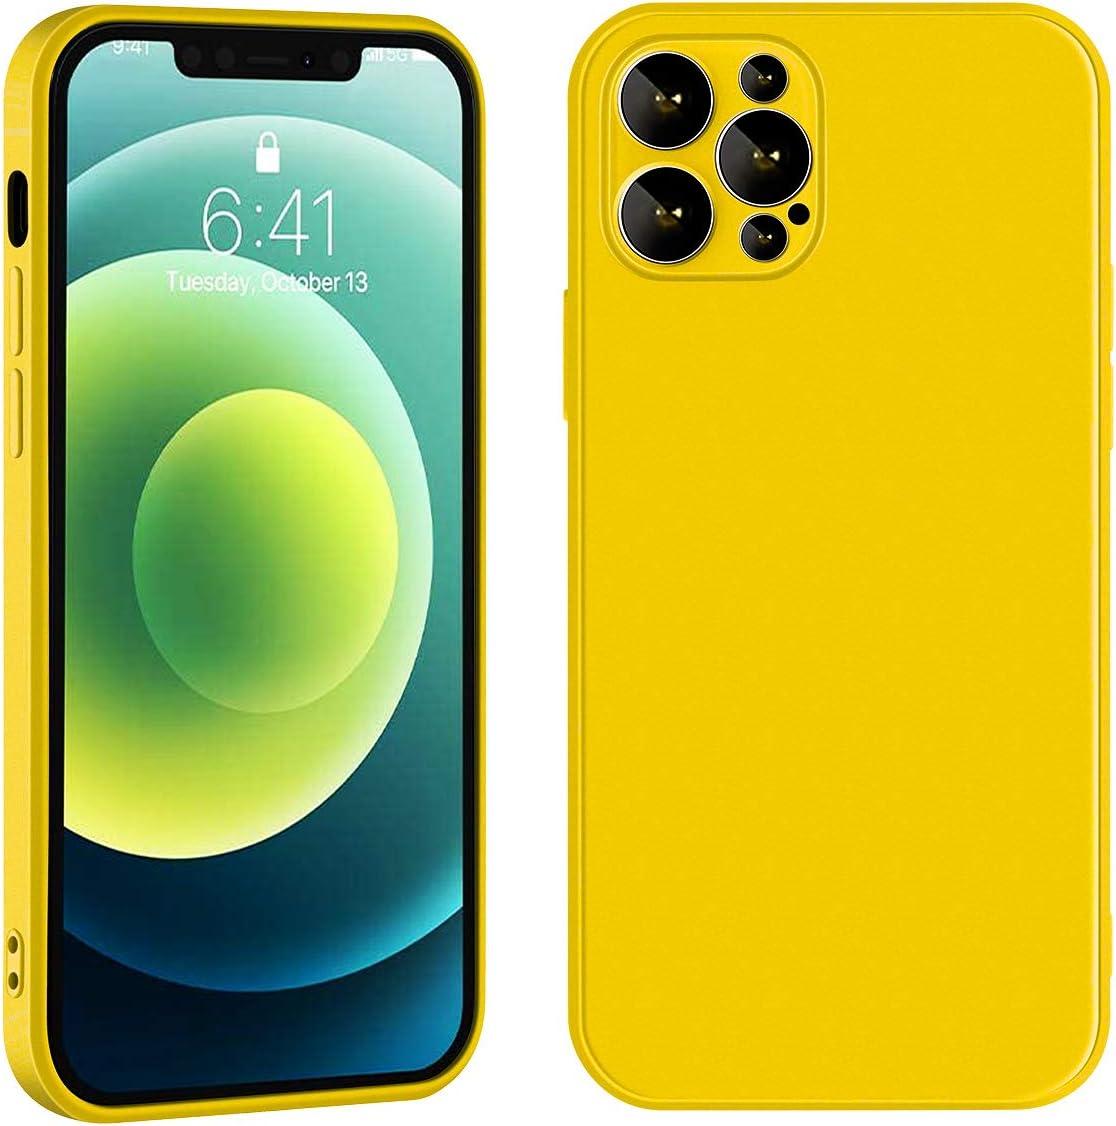 Manducary Liquid Silicone Case Compatible with iPhone 12/Mini/Pro/Max (2020), Gel Rubber Full Body Protection Cover Case Drop Protection Case (Yellow,iPhone 12 pro max)